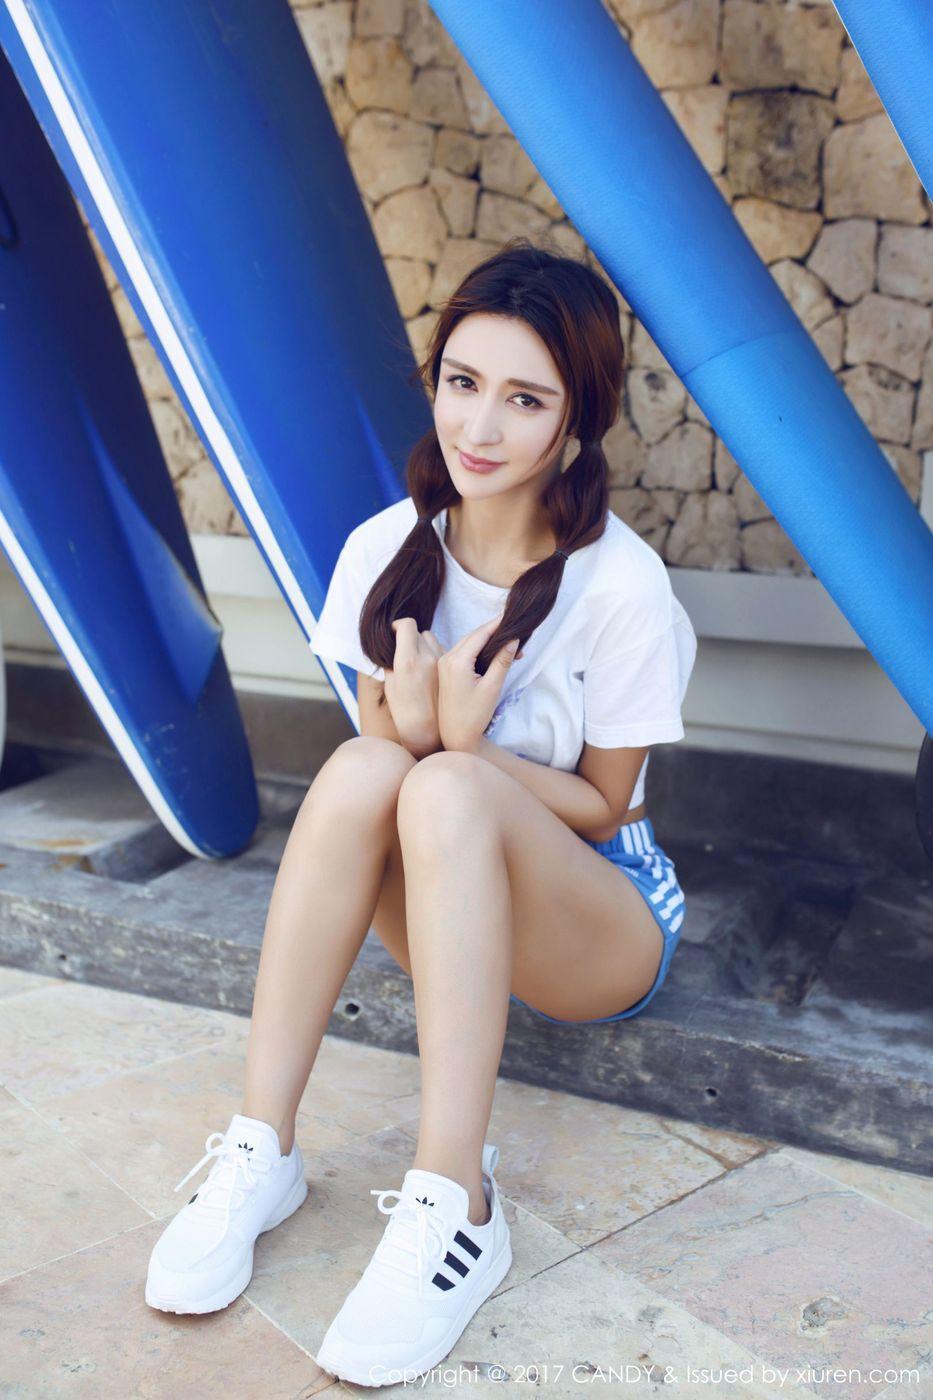 [CANDY糖果画报] 混血美女模特伊莉娜巴厘岛沙滩甜美旅拍第一套 Vol.024